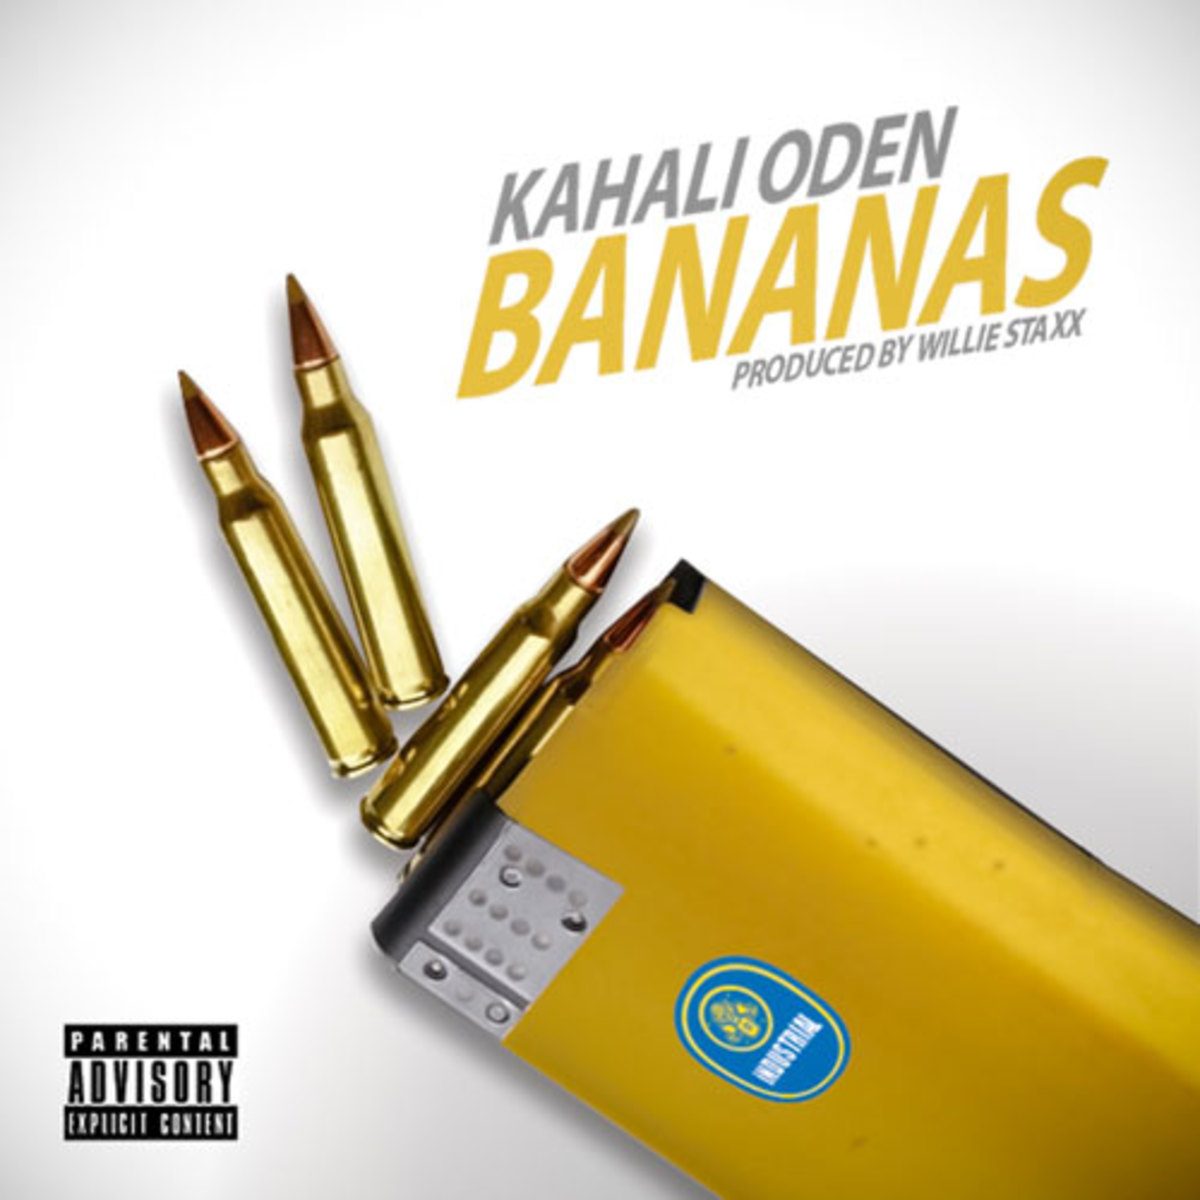 kahalioden-bananas.jpg